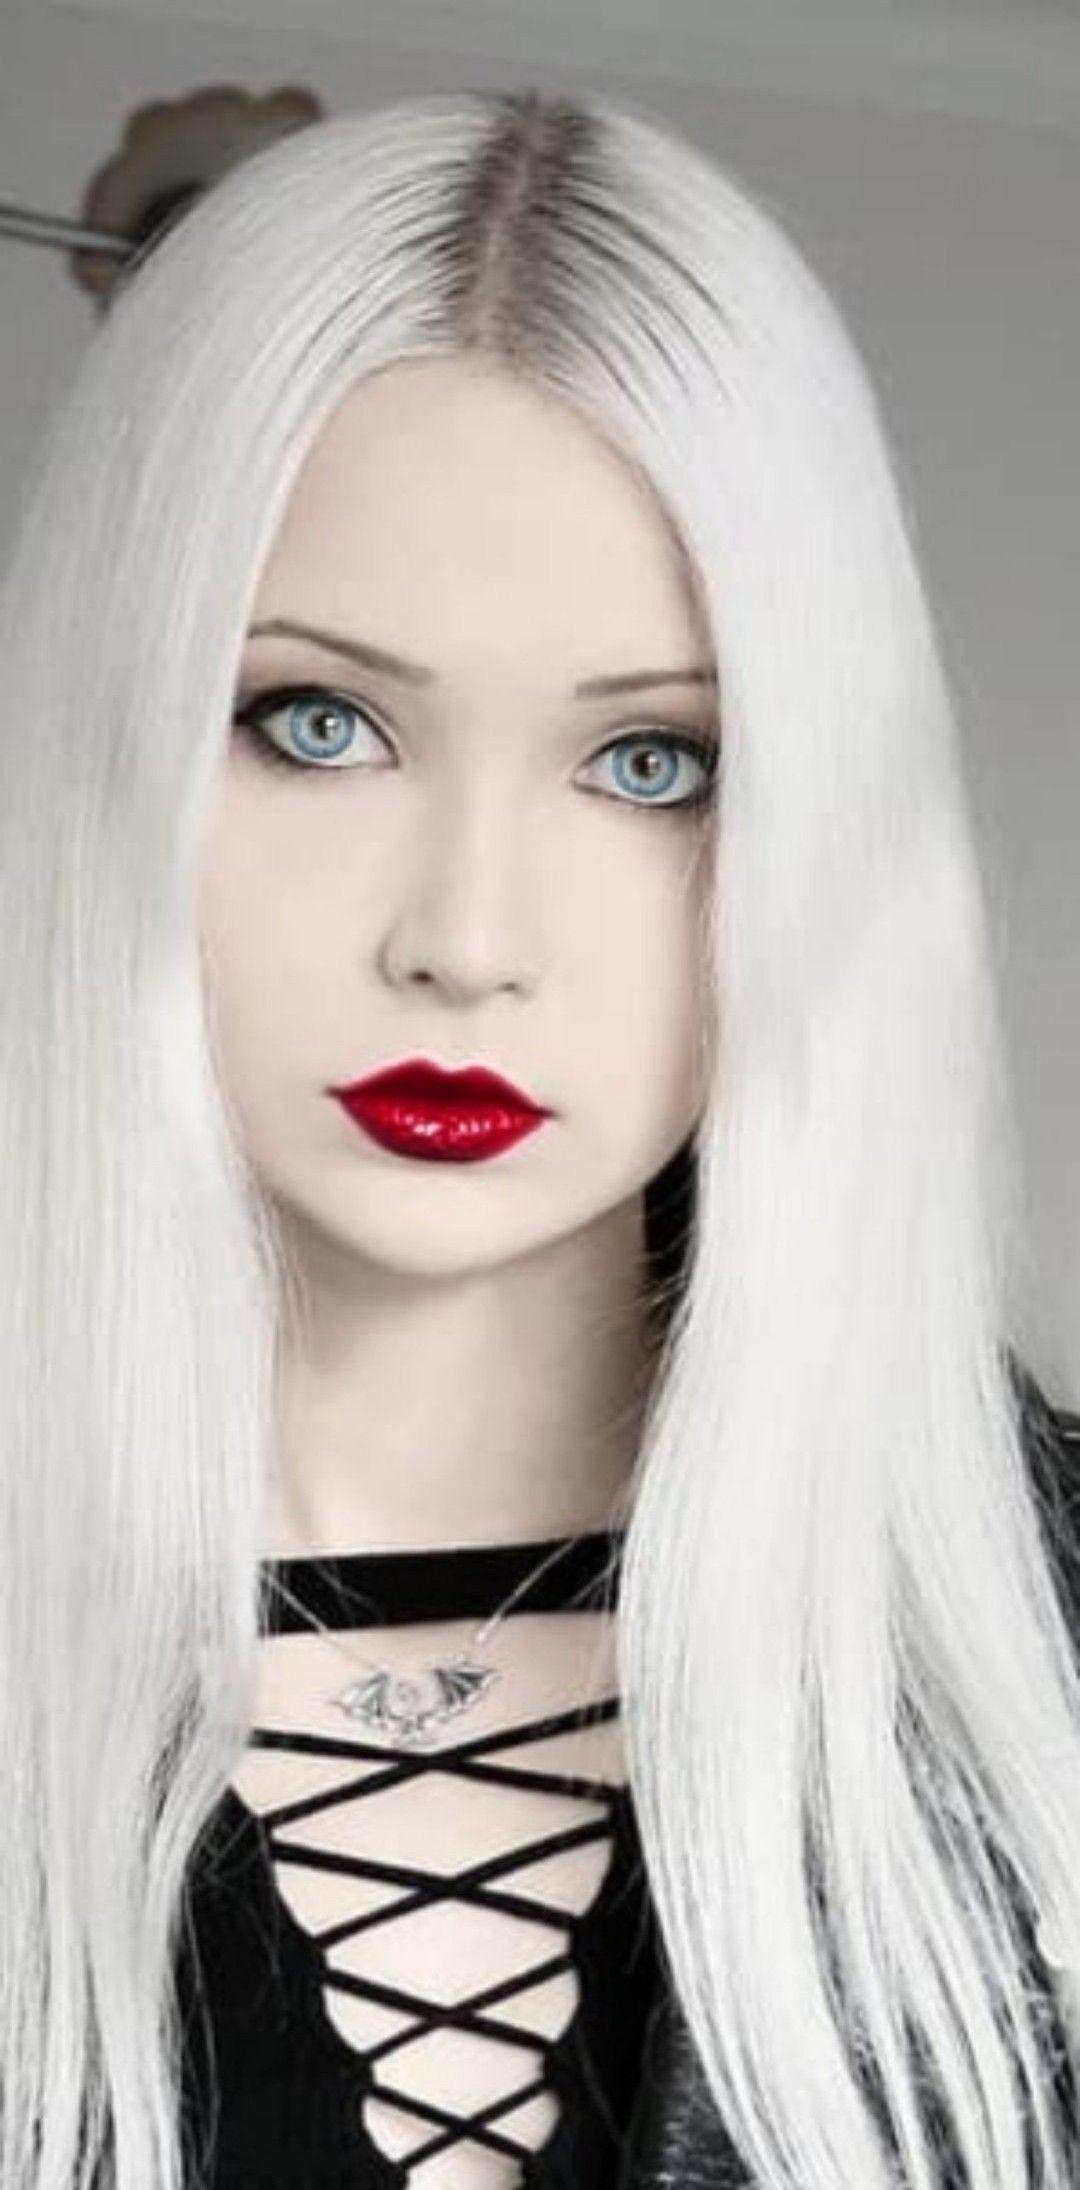 Goth Gothic Goth Girl Alternative Emo Scene Punk Emo Girl